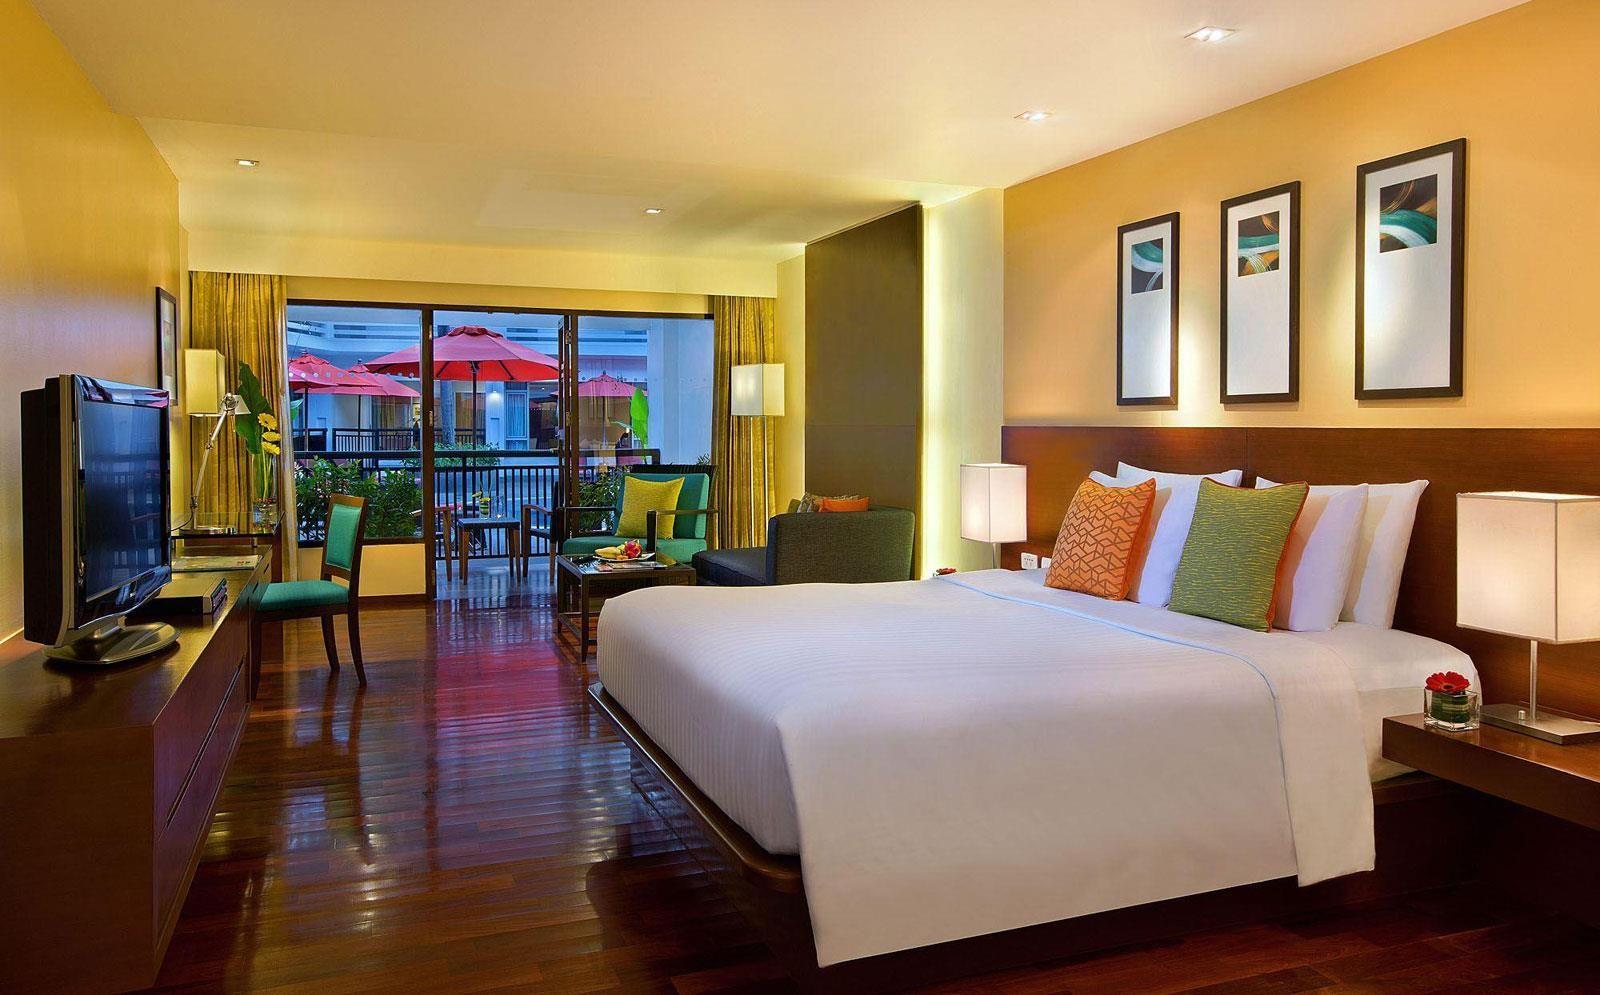 هتل سوئیس اتل ریزورت پوکت کامالا بیچ